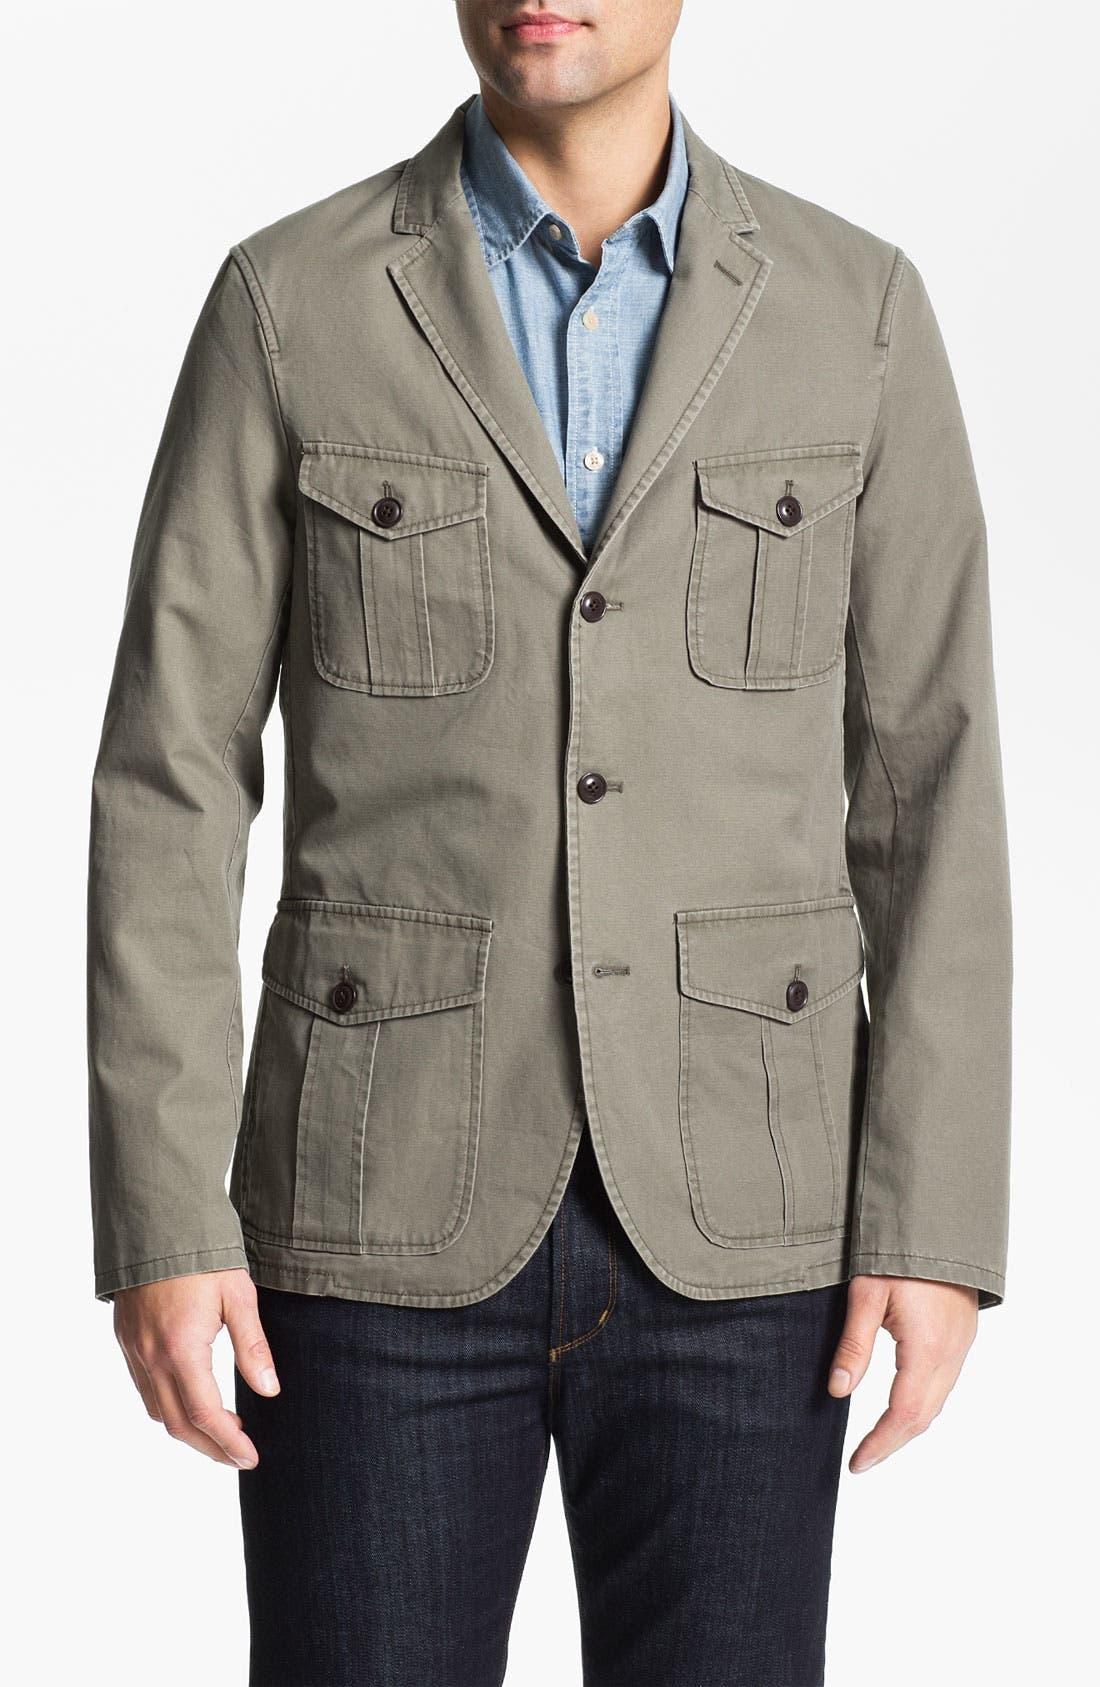 Main Image - Wallin & Bros. Sportcoat